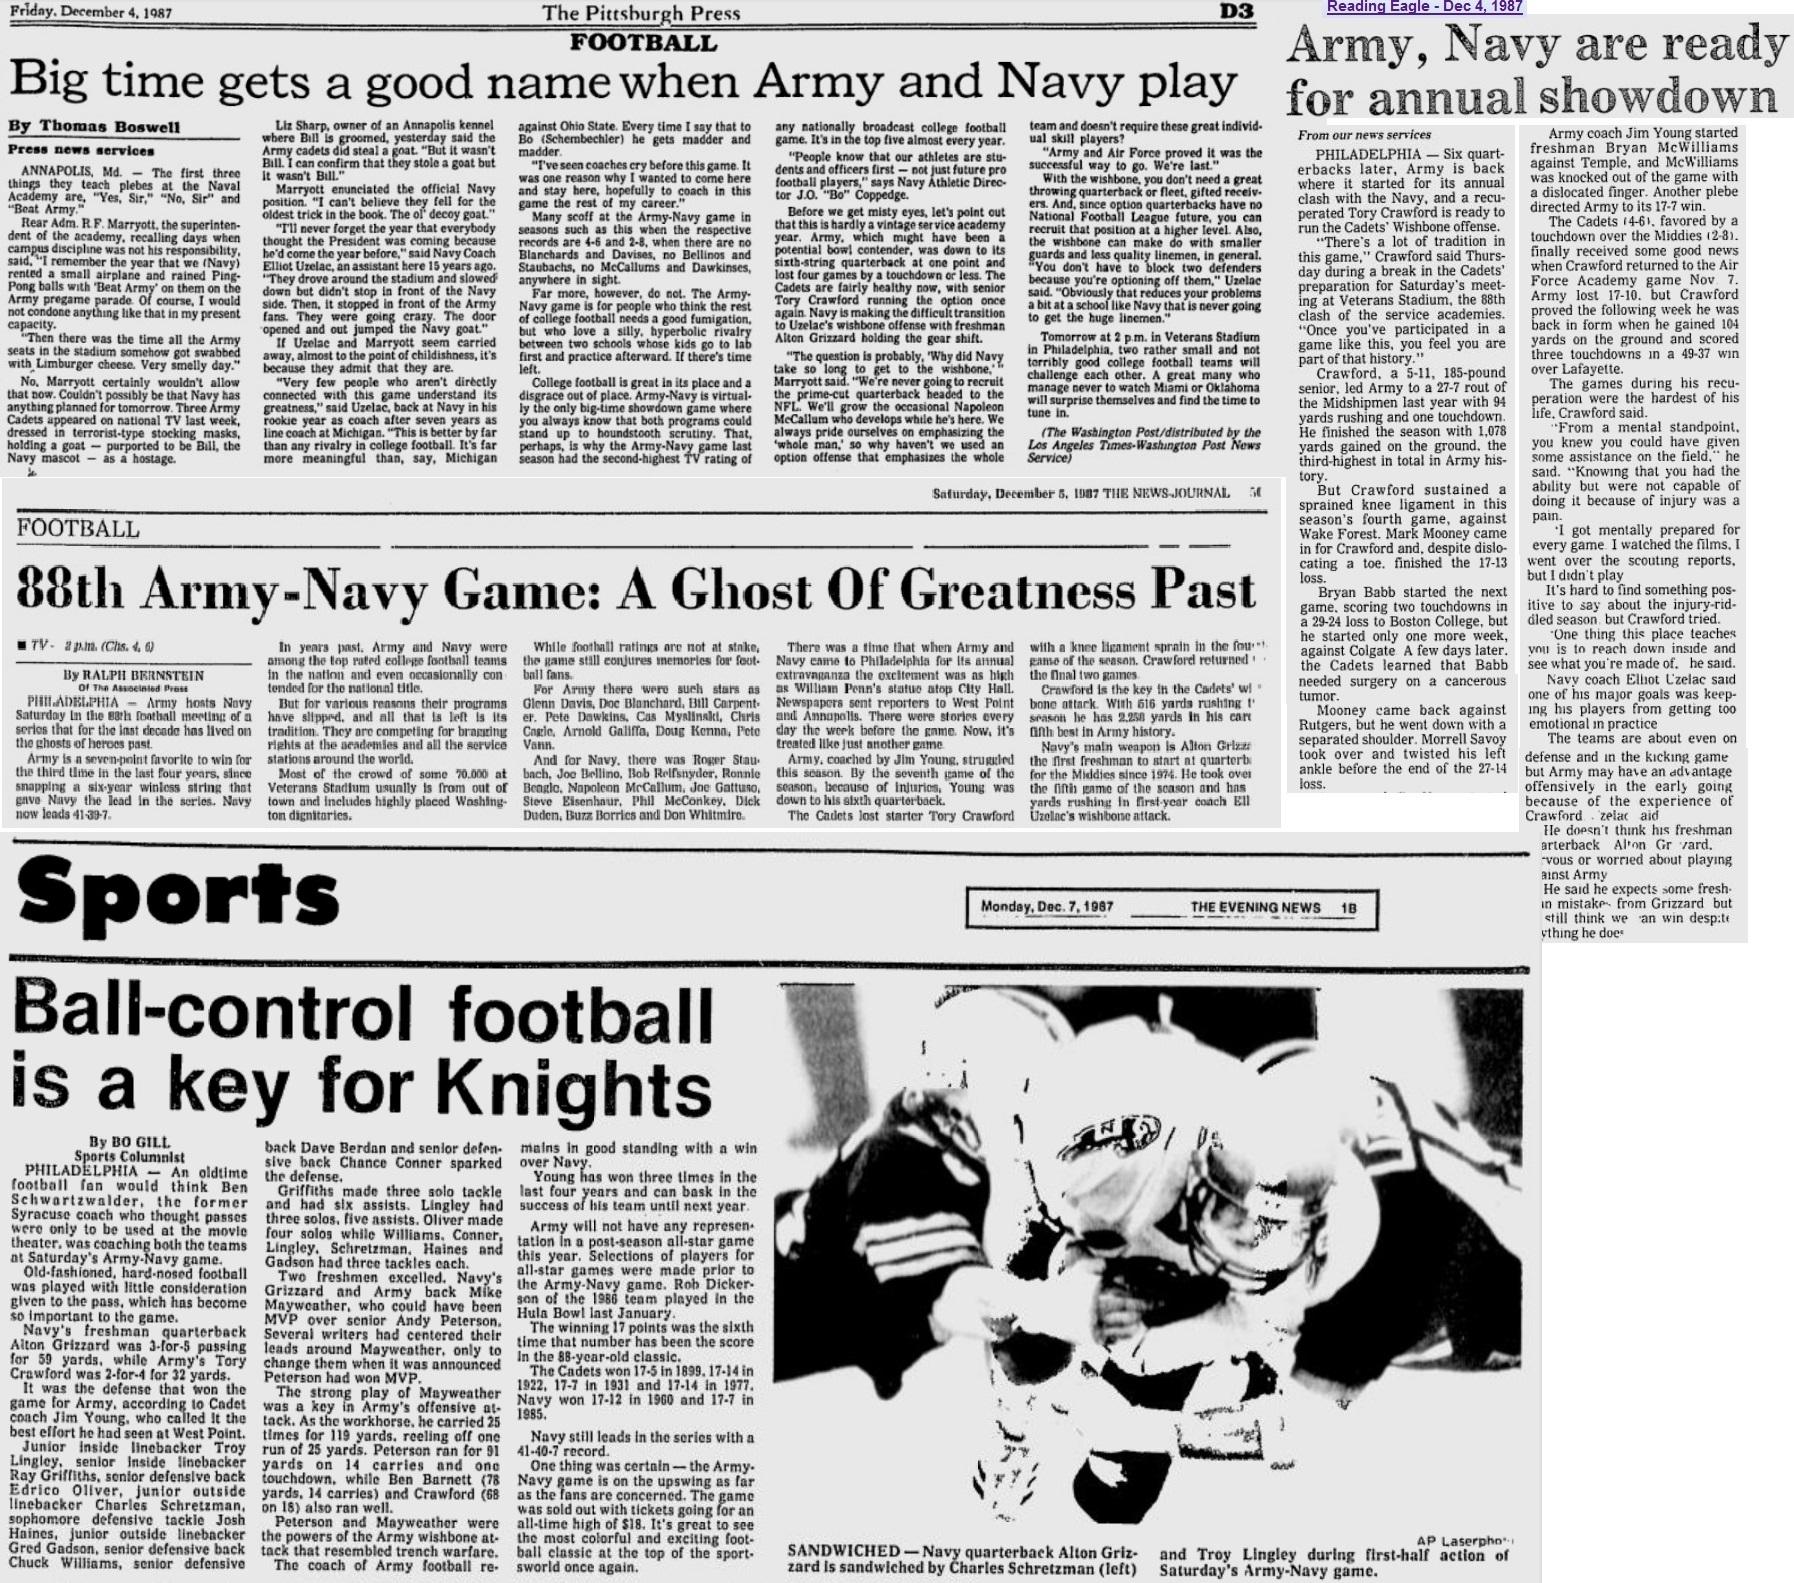 armyfb_1987_vsnavy-pre_various_dec1987